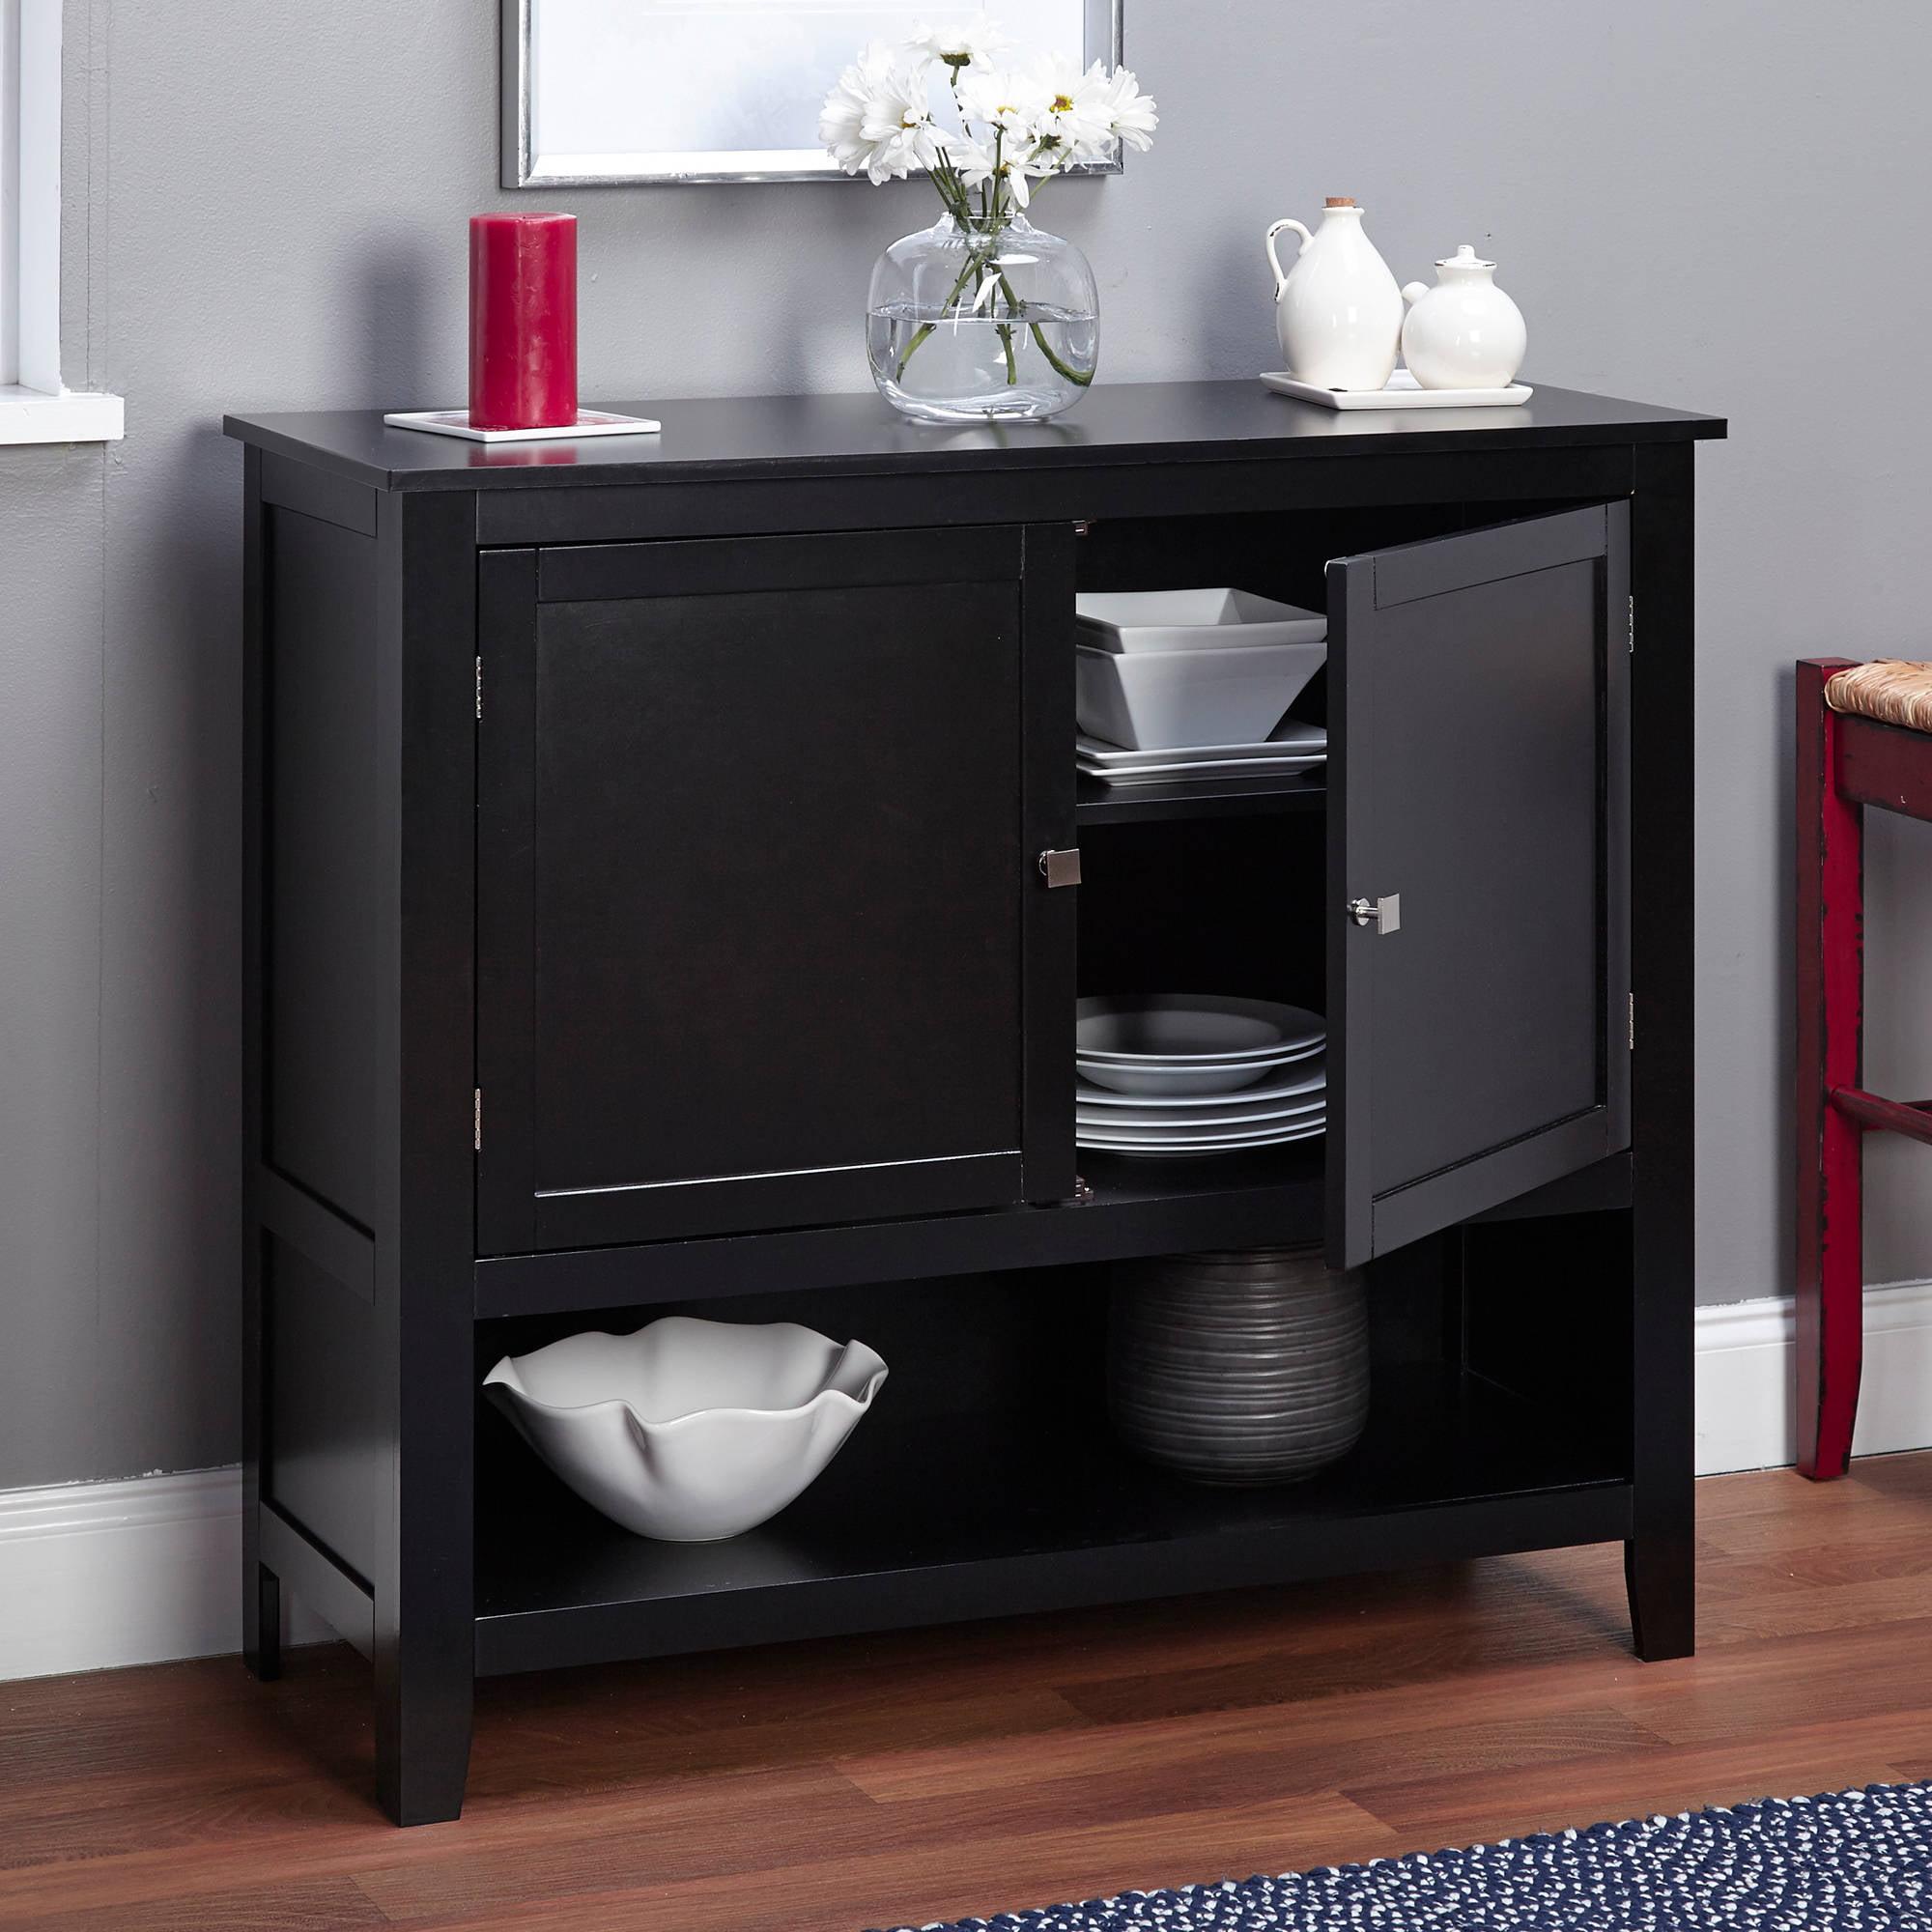 Cabinet Kitchen Buffet Storage Adjustable Shelves Wooden Red Finish  Furniture 24319110007 | EBay